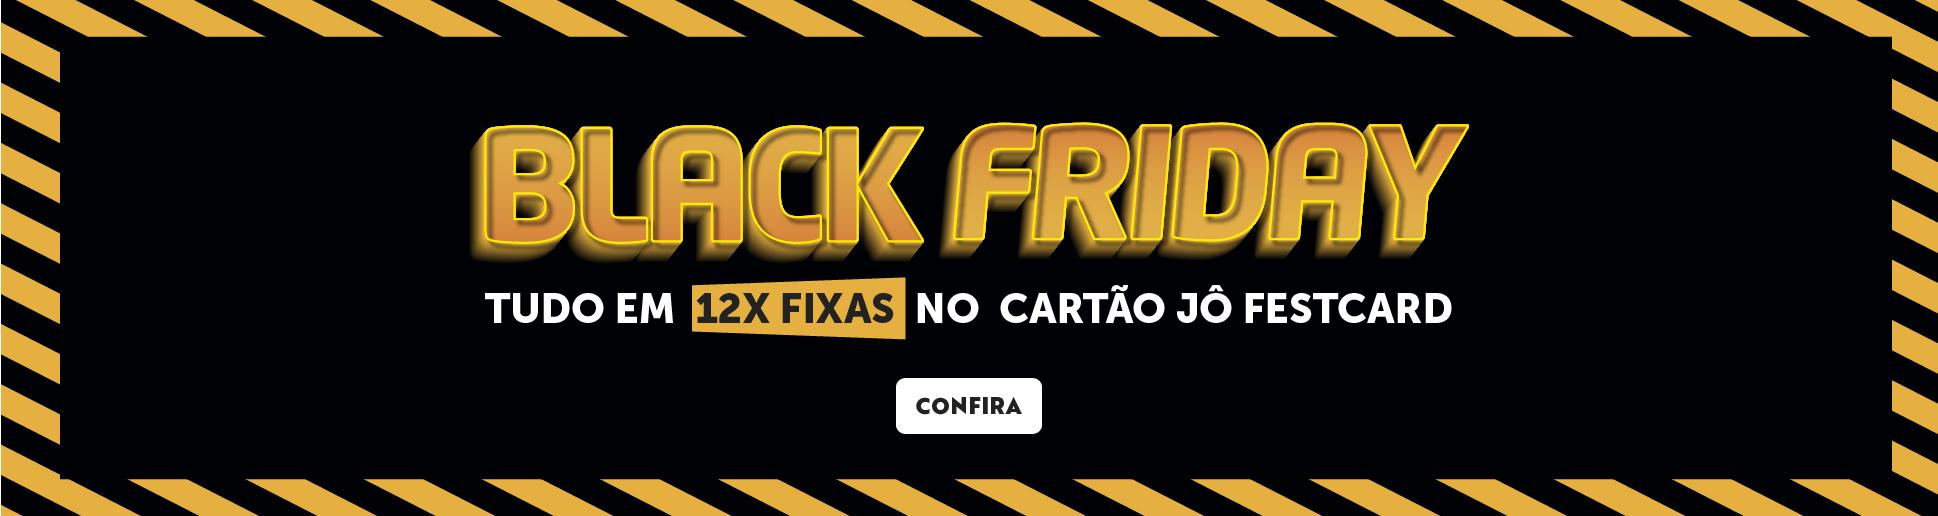 Black Friday Jô 2020